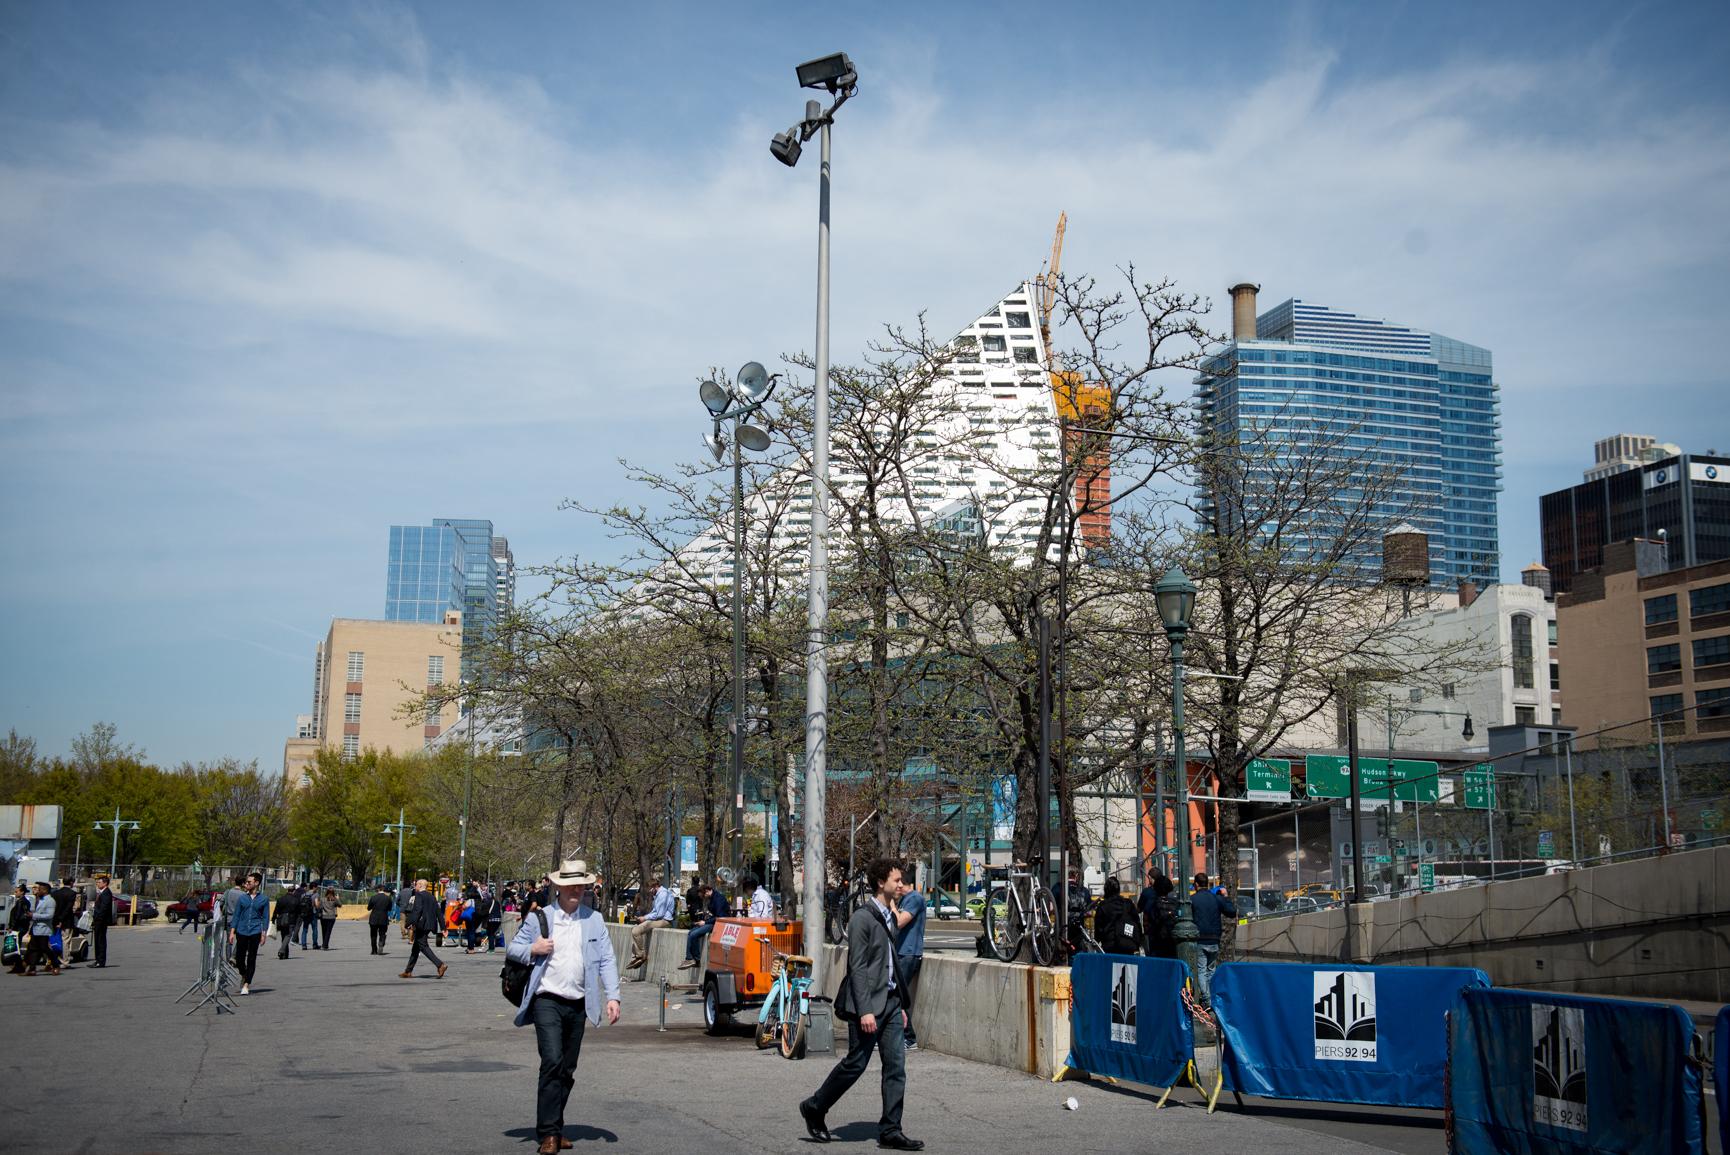 2016-04-21 Photo Sesh Tech Day - Pier 92 & 94 - NYC-3932.jpg